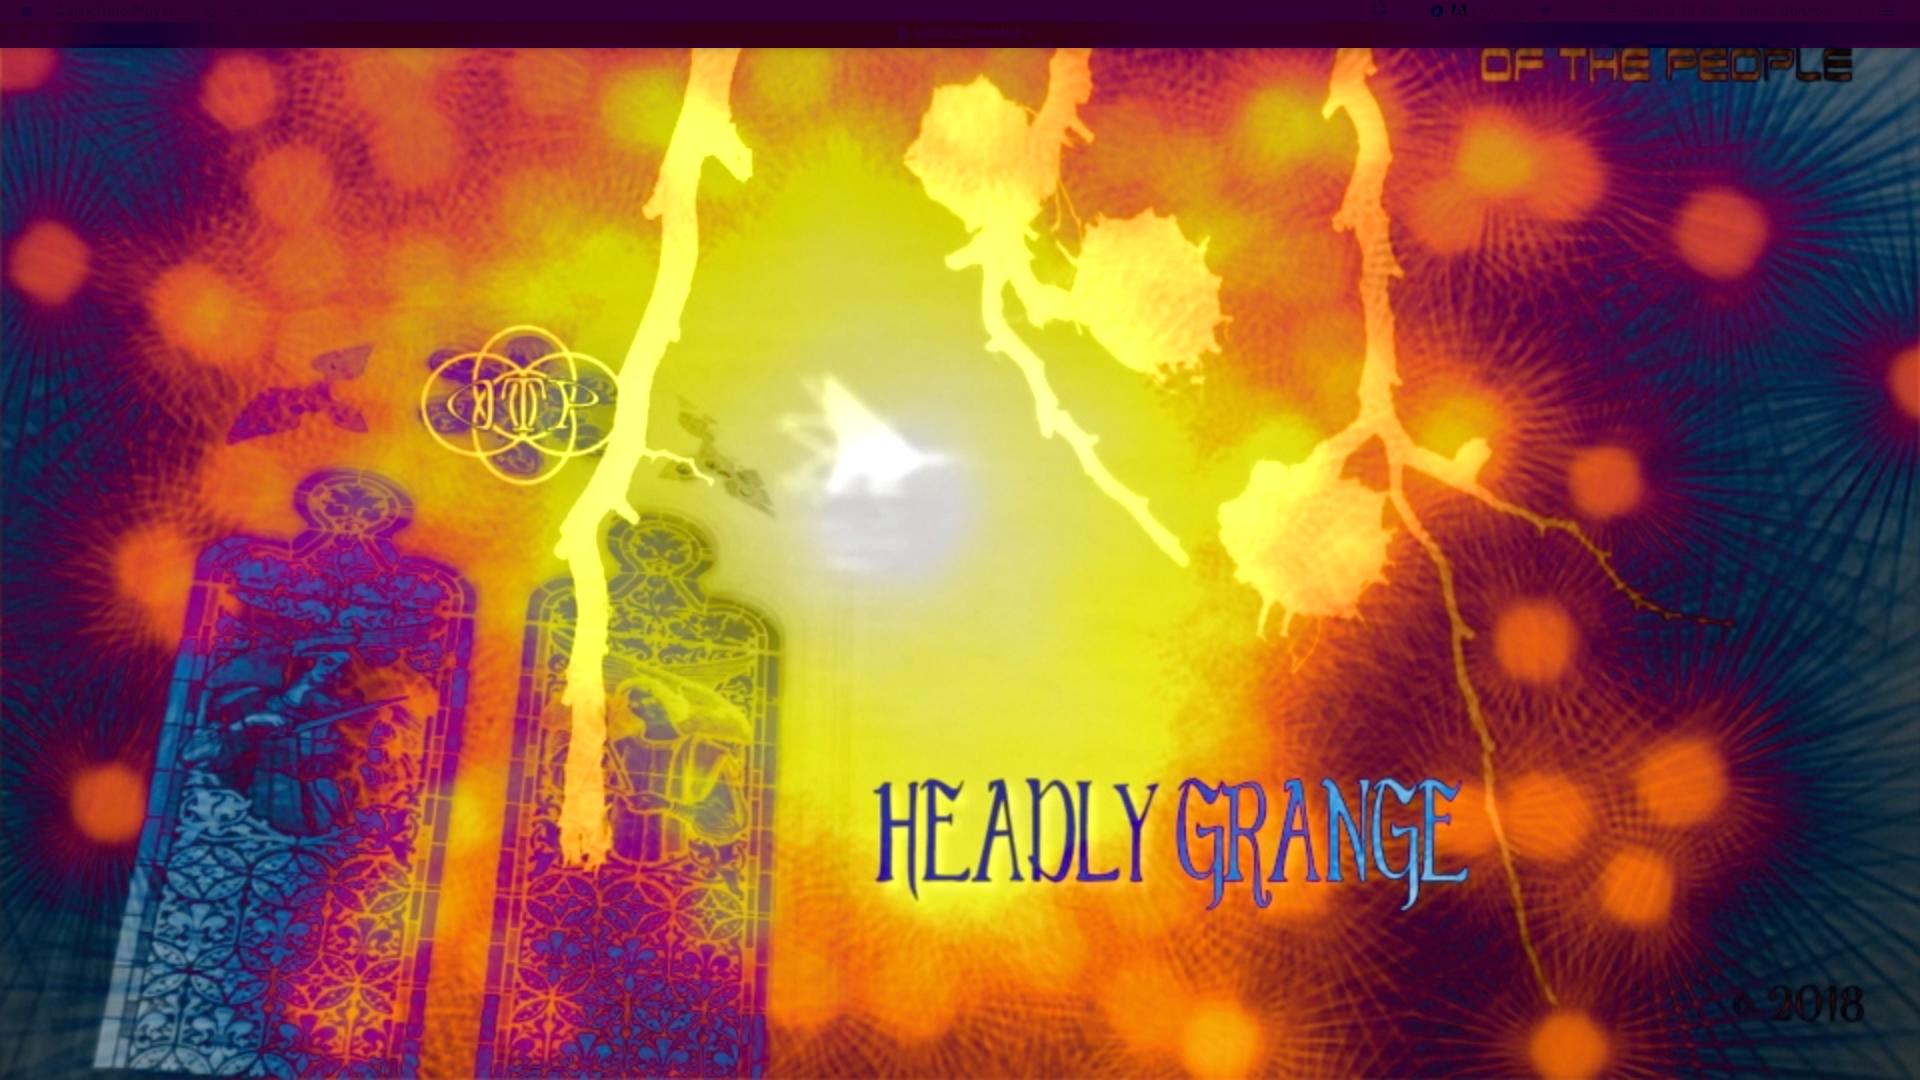 Headly Grange